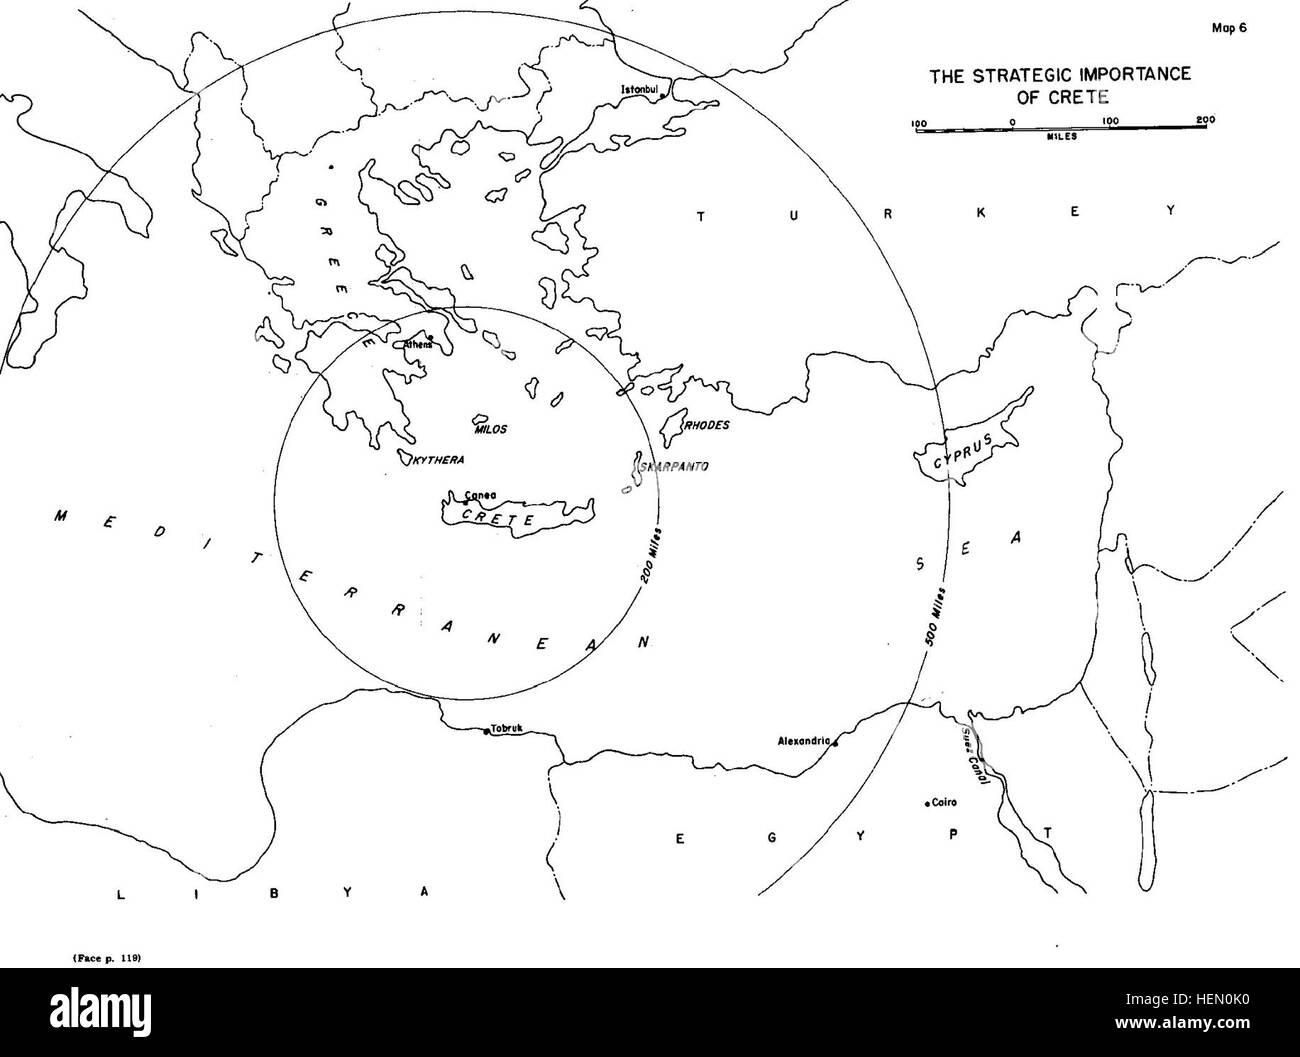 Strategic Importance Of Crete In World War Ii Map Stock Photo